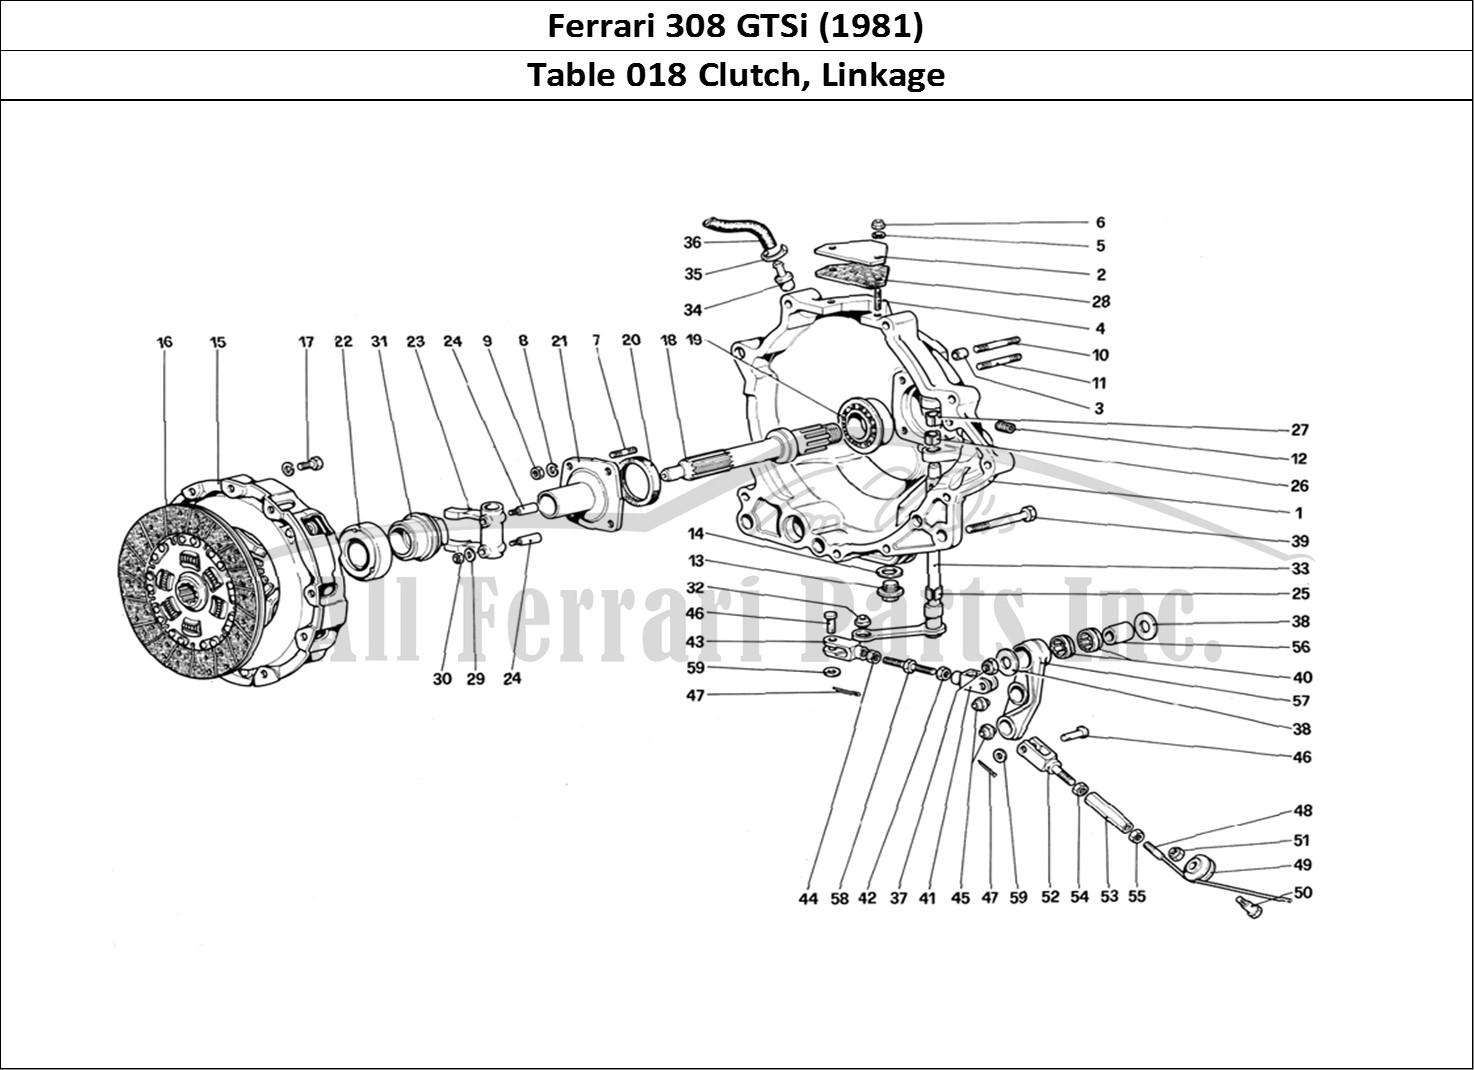 Buy original Ferrari 308 GTSi (1981) 018 Clutch, Linkage